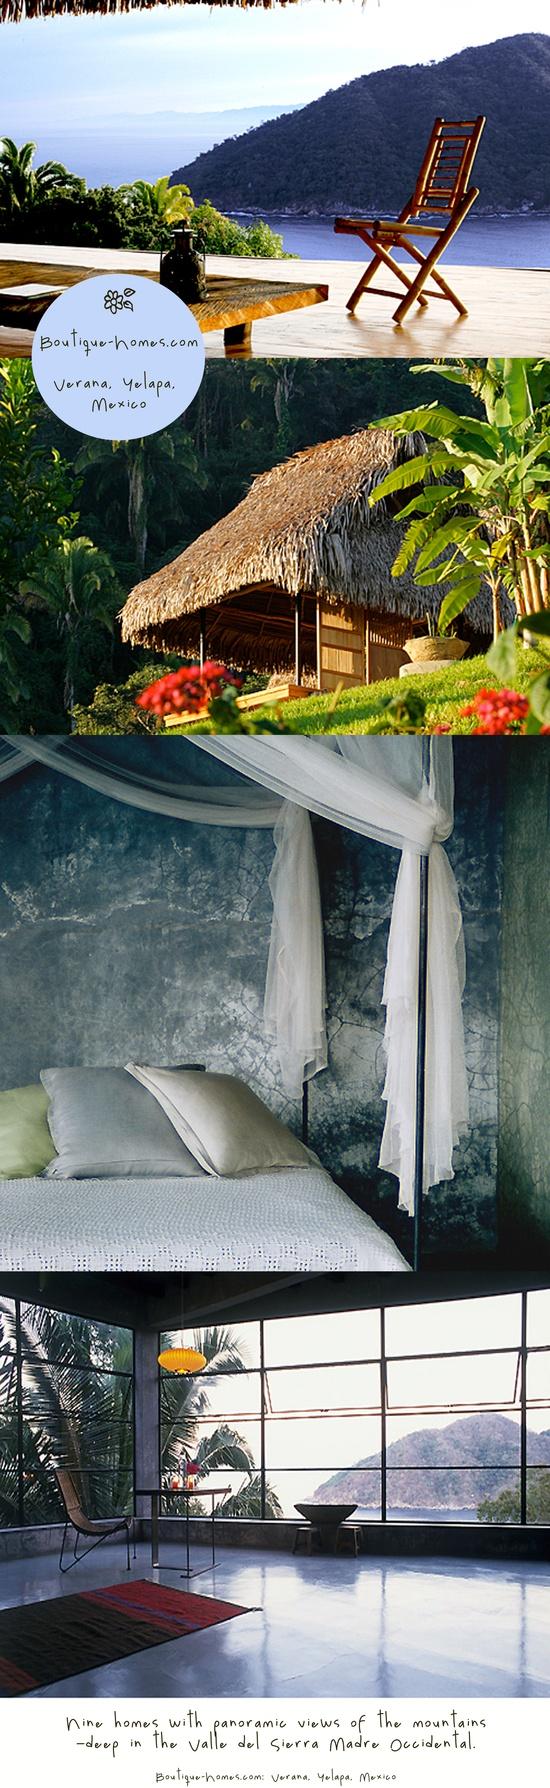 Best 25 Exotic Places Ideas On Pinterest Thai Food Garland Greece Honeymoon And Santorini